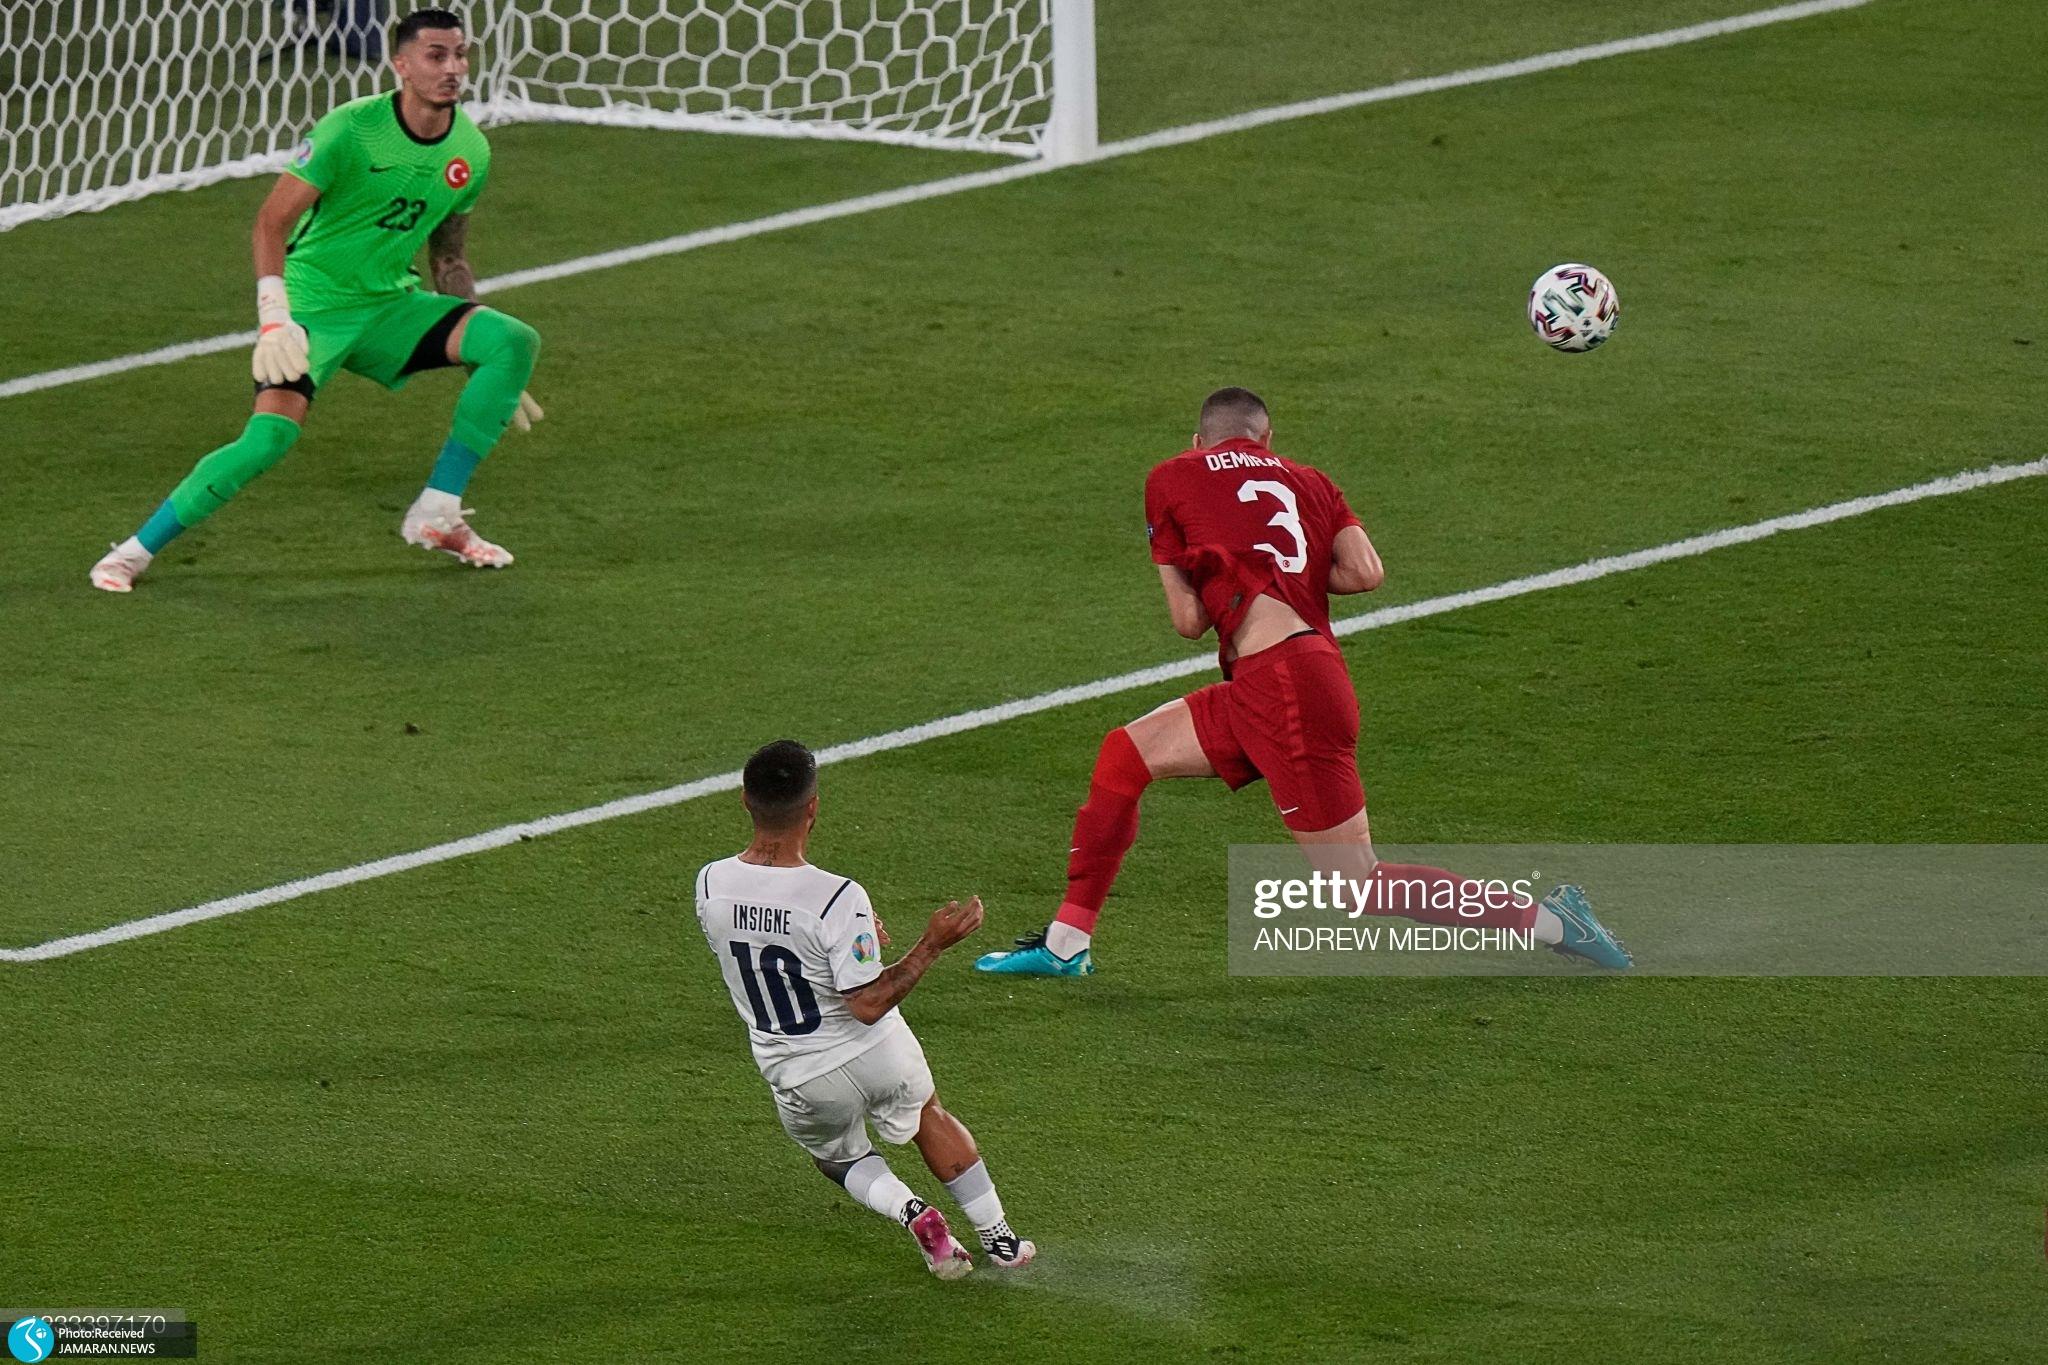 یورو ۲۰۲۰ - تیم ملی فوتبال ترکیه تیموملی فوتبال ایتالیا